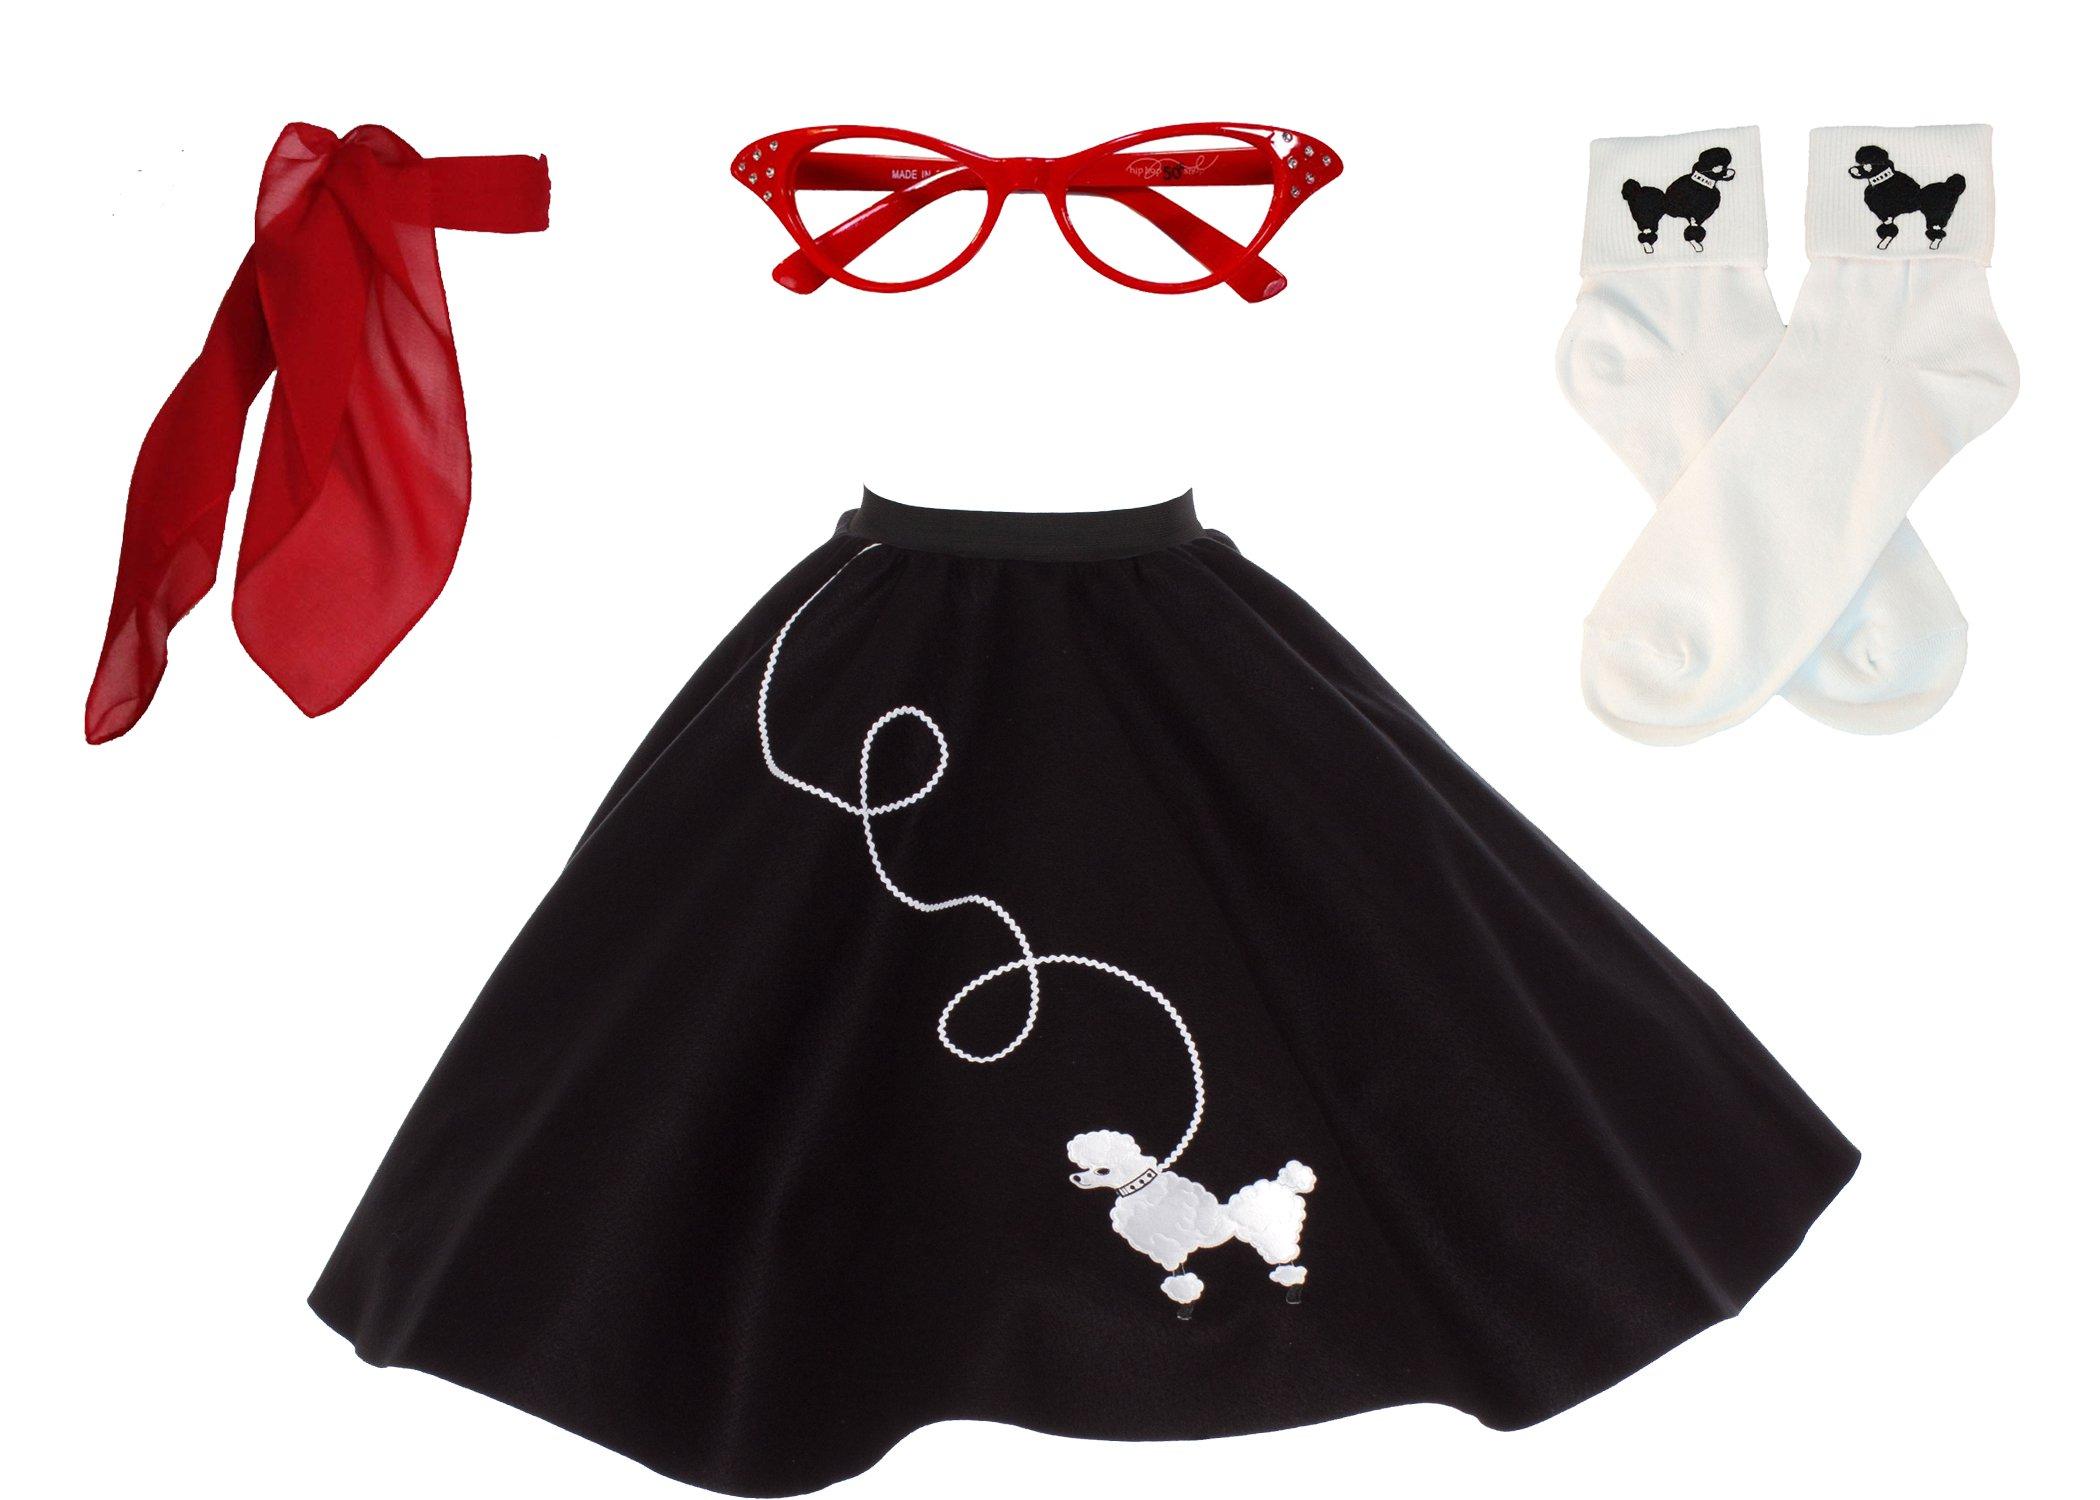 Hip Hop 50s Shop Adult 4 Piece Poodle Skirt Costume Set Black and Red XLarge/XXLarge